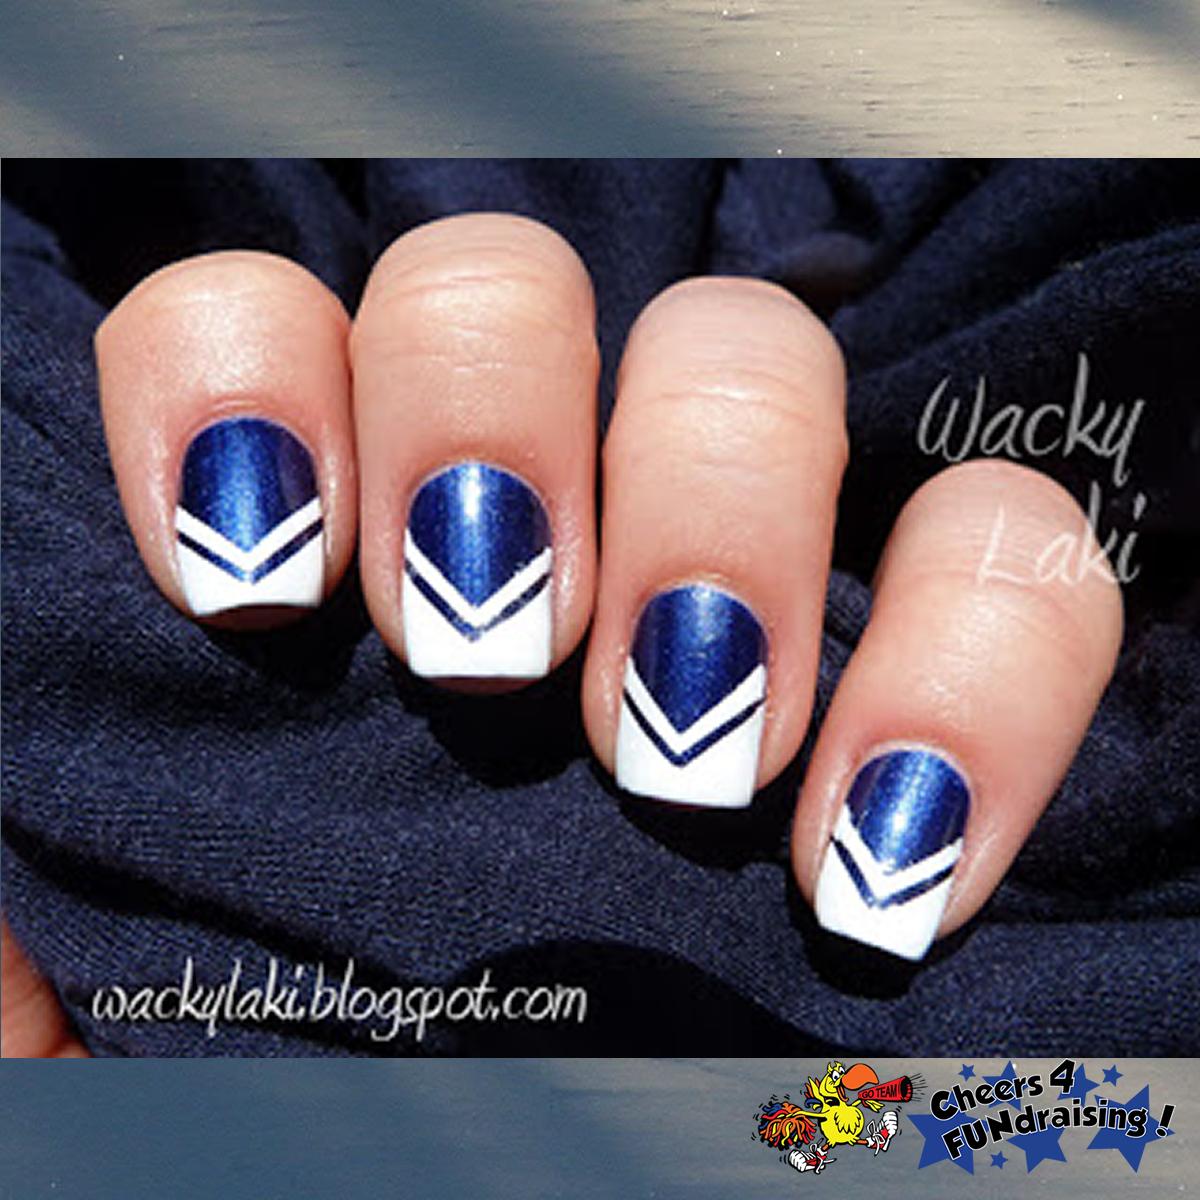 Love This Cute Cheerleader Nail Design From Blogspots Wacky Laki